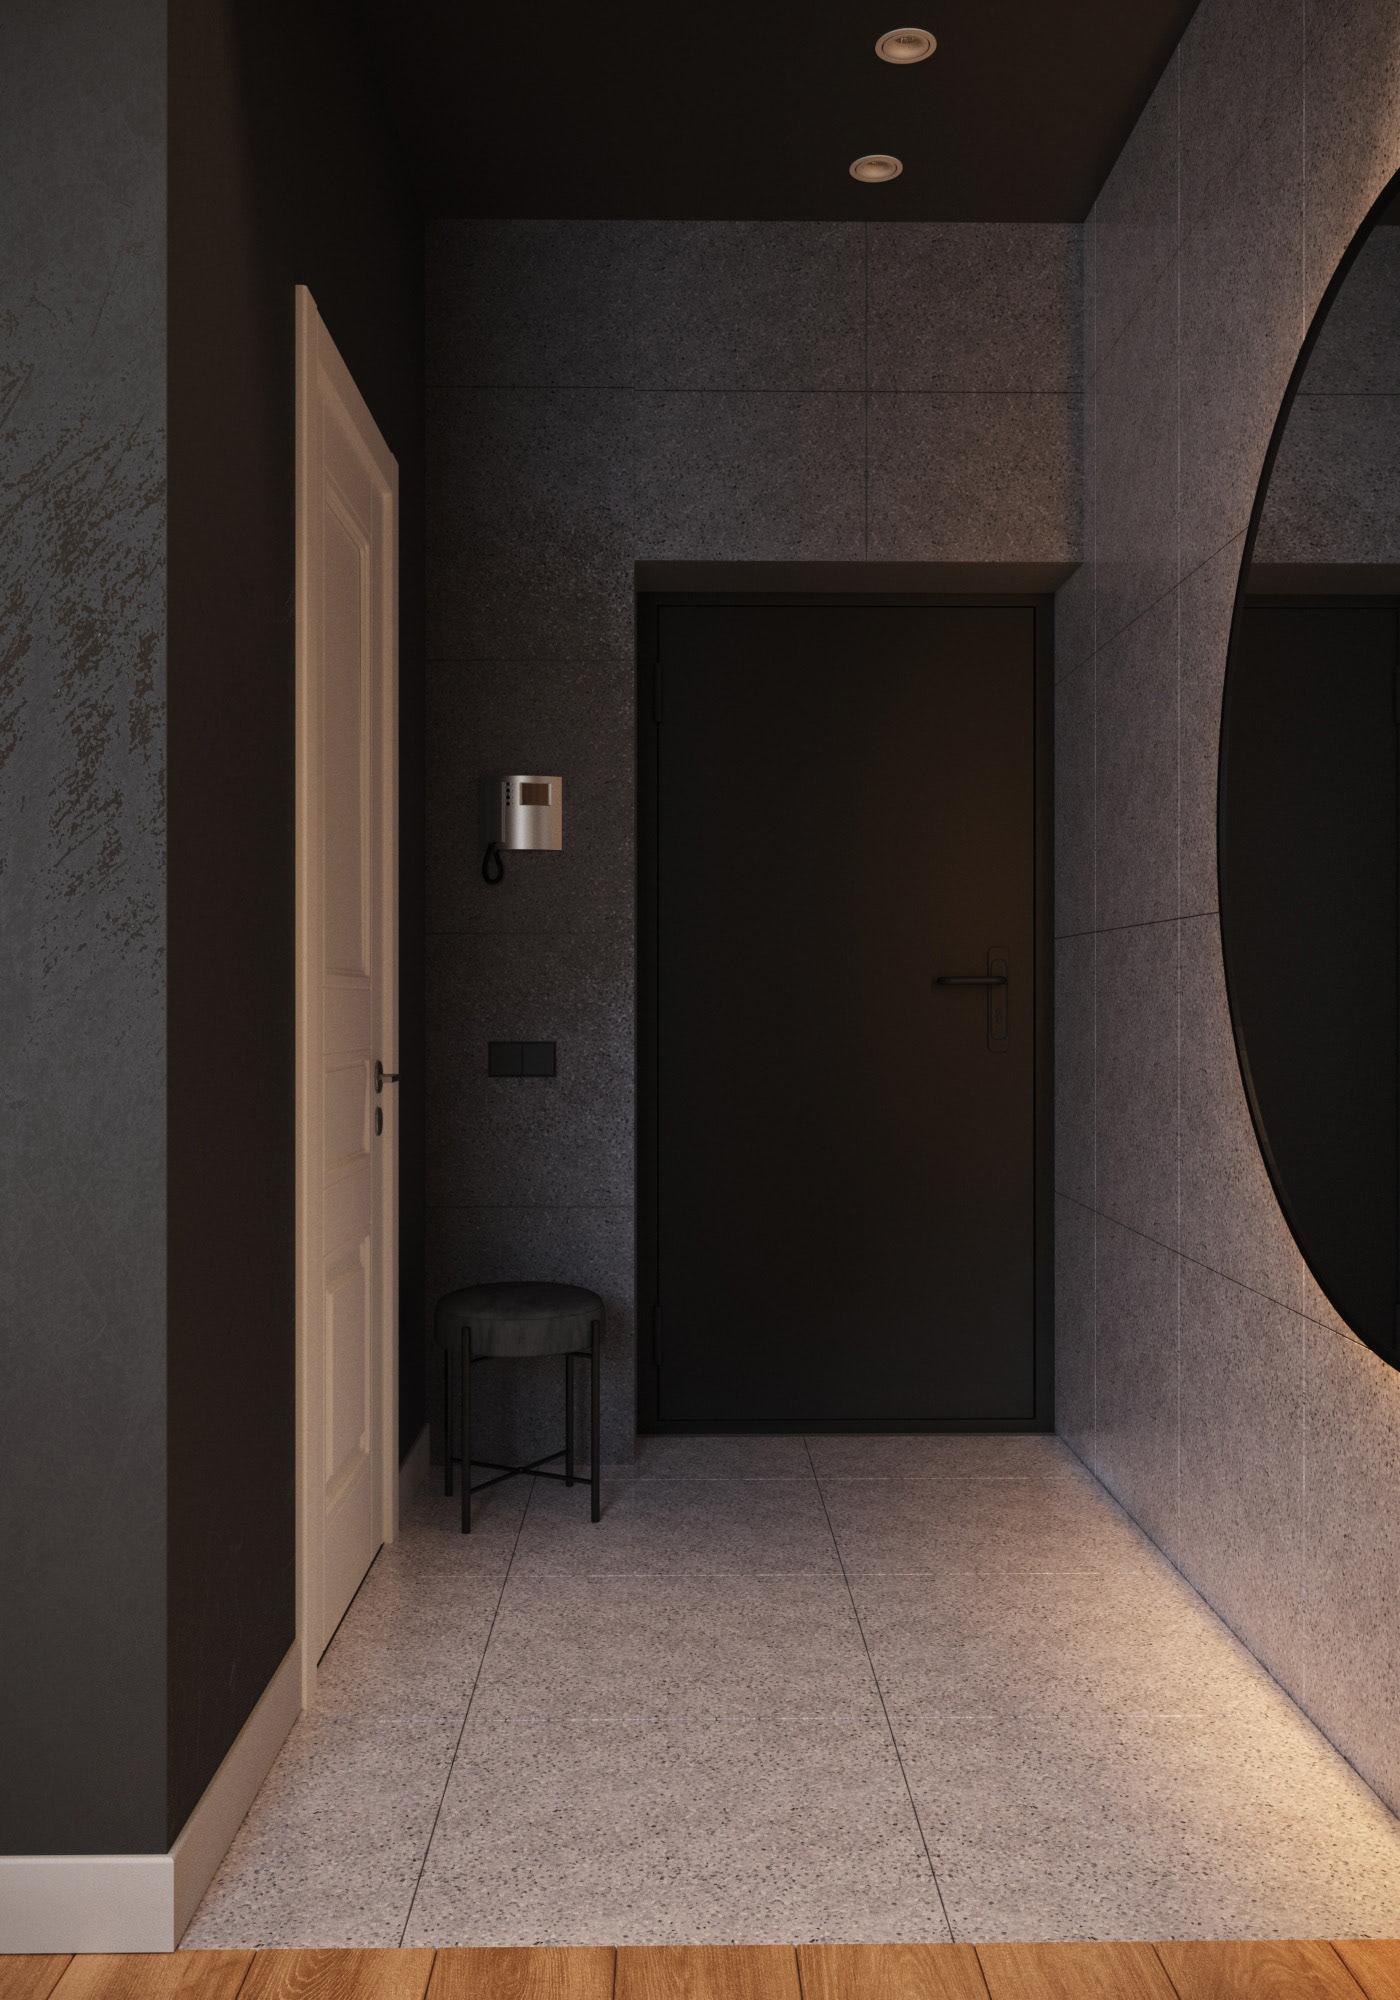 Image may contain: wall, door and bathroom